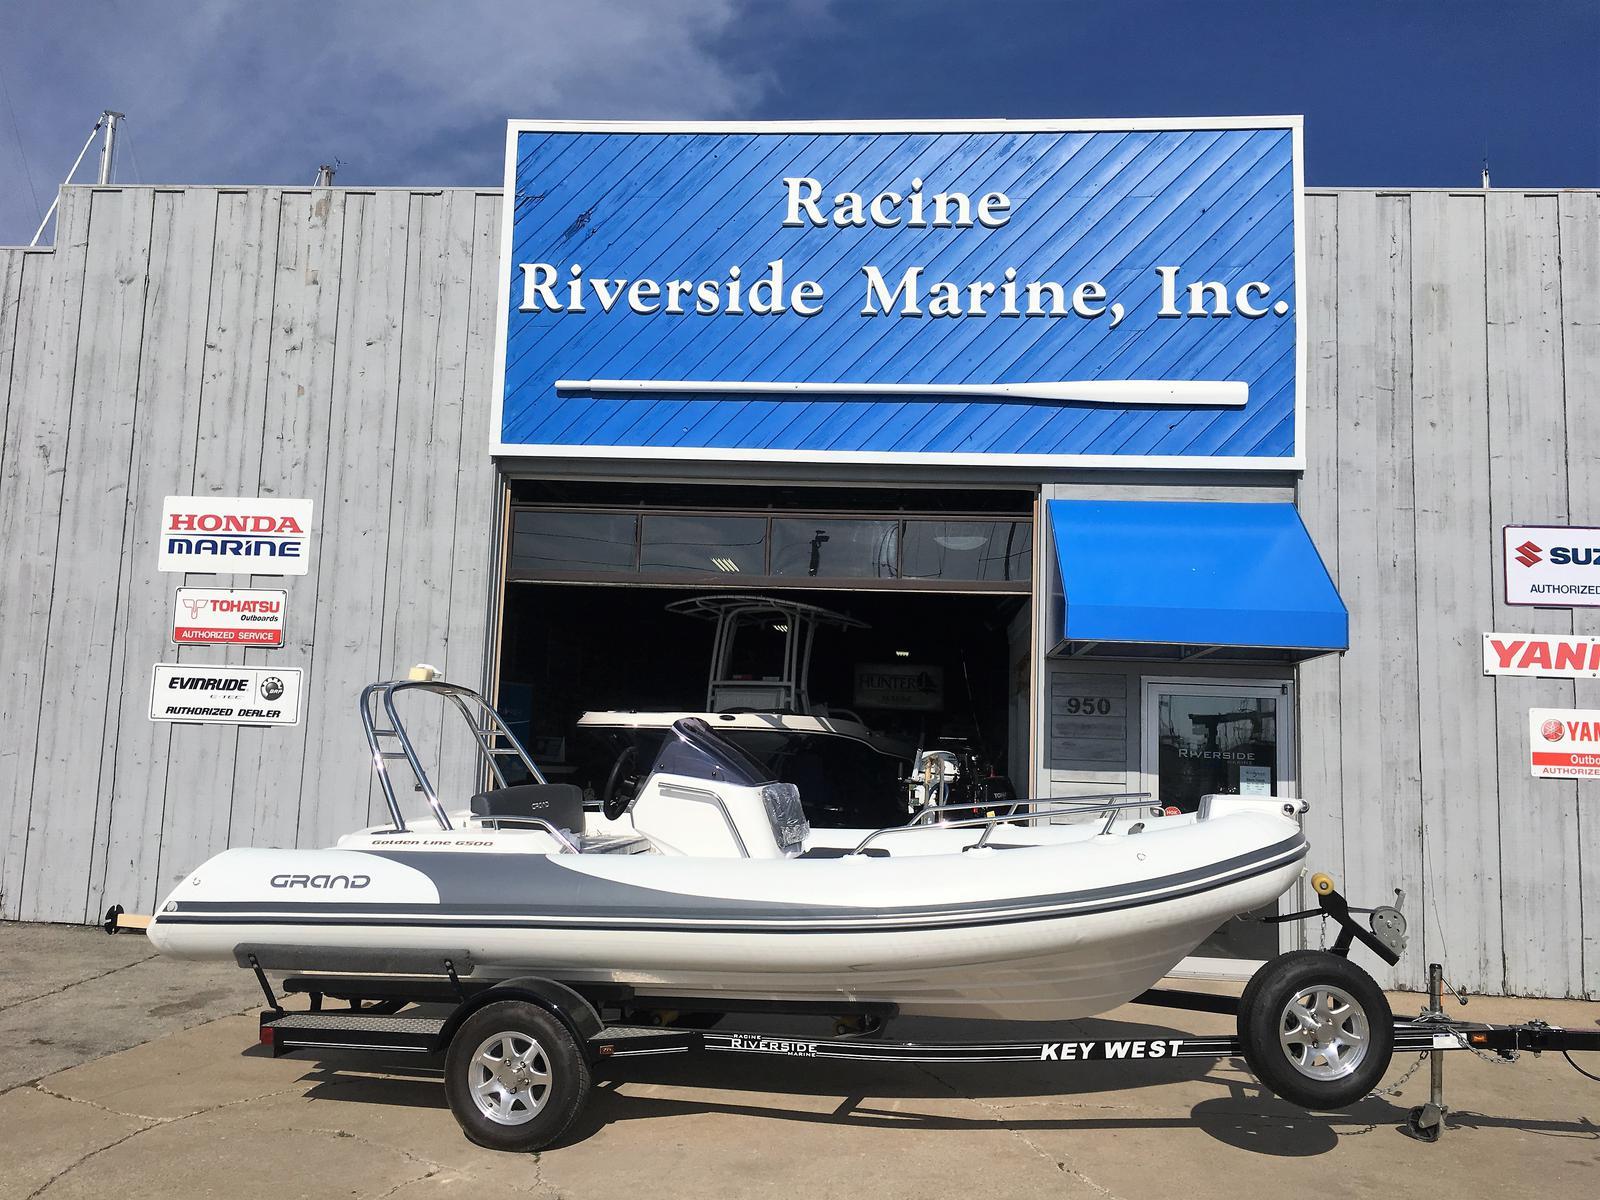 Inventory from Grand Marine Racine Riverside Marine Racine